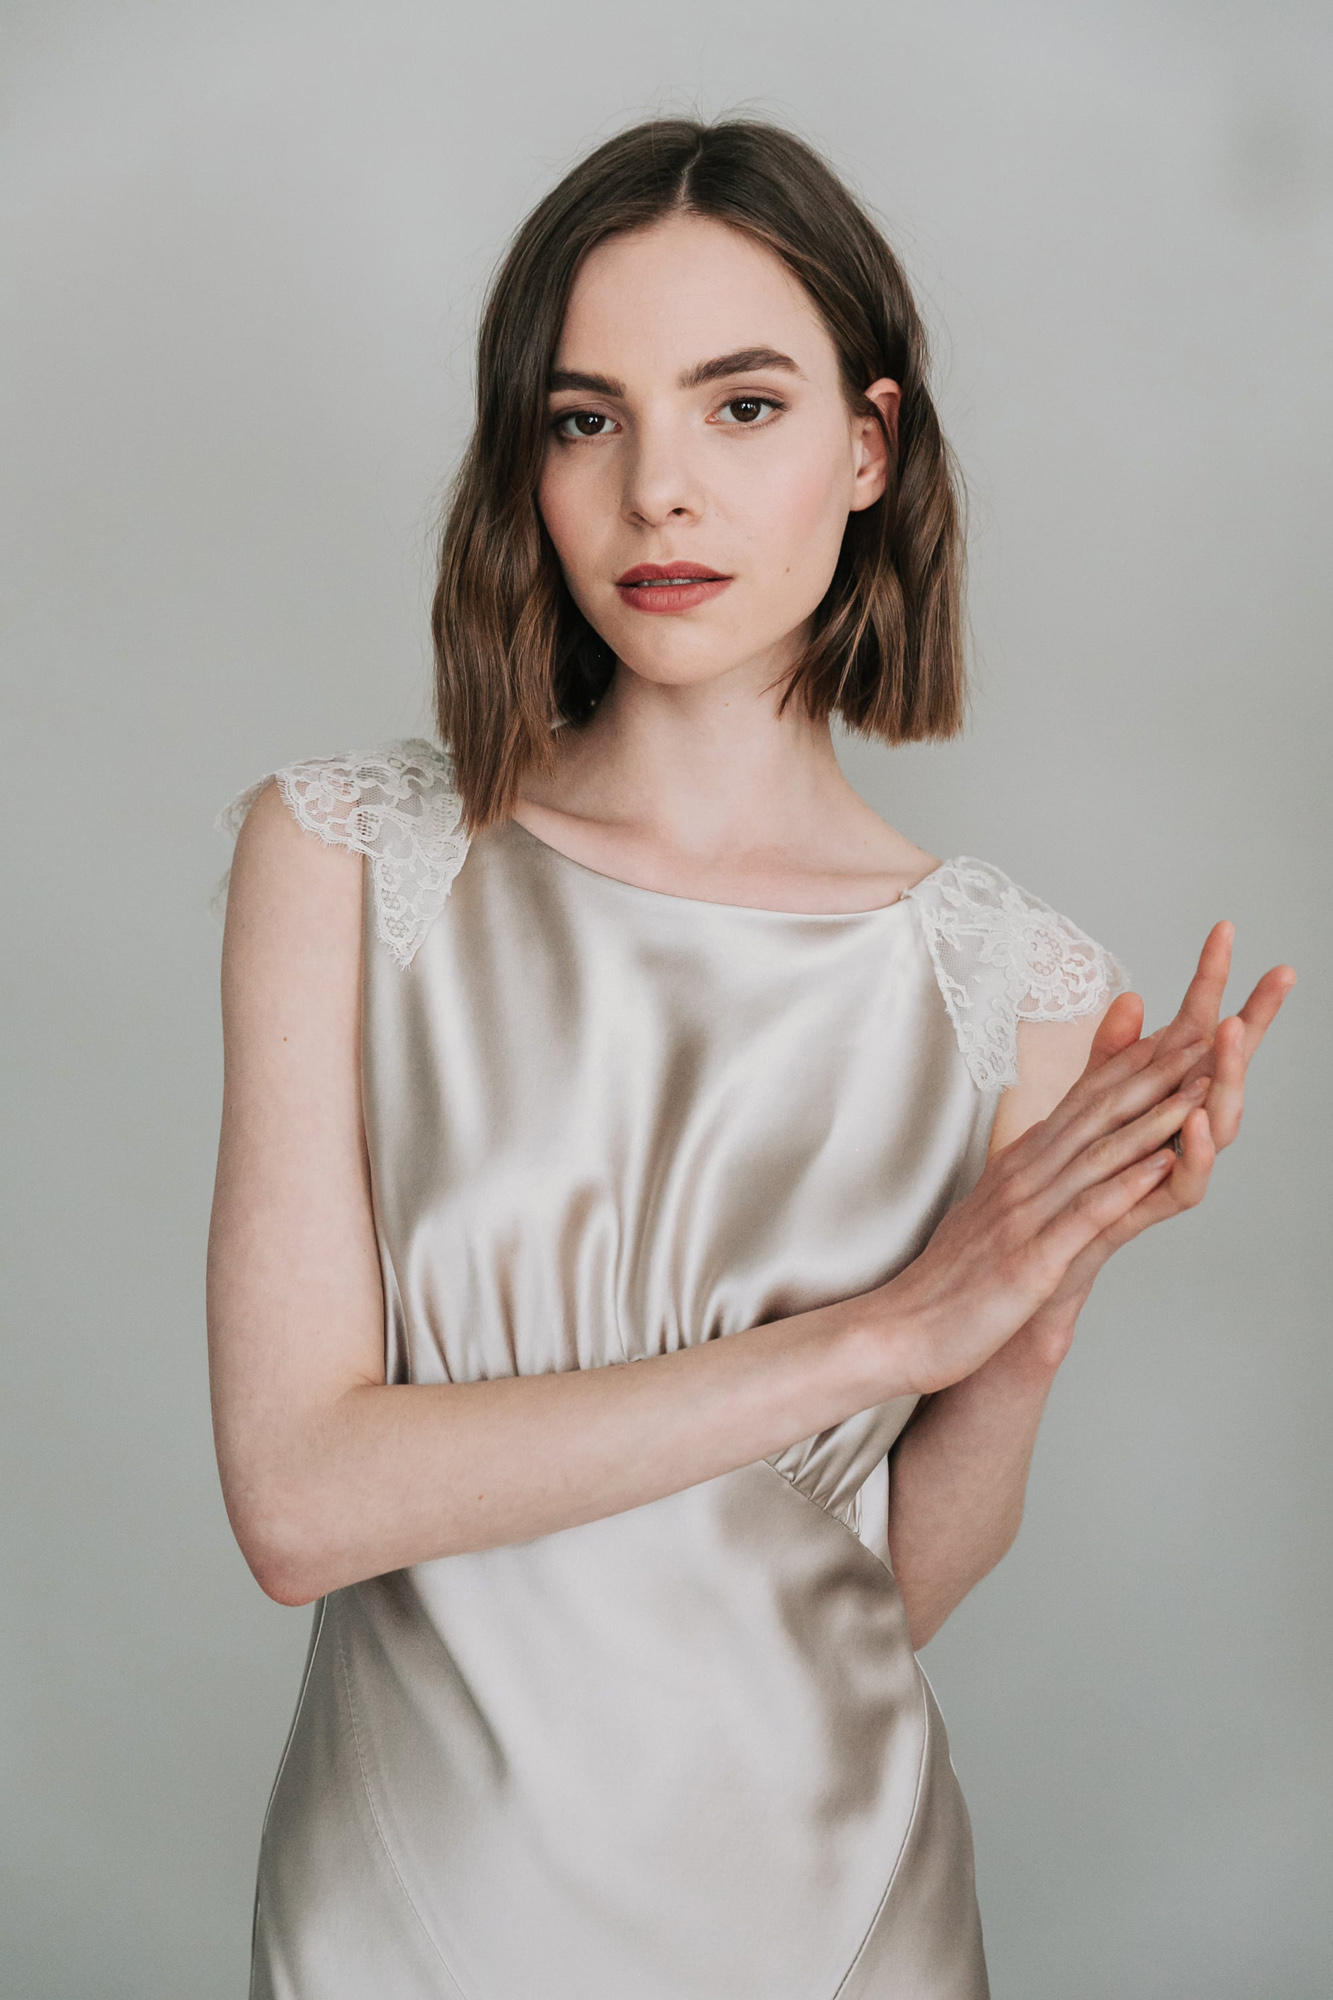 Kate-Beaumont-Sheffield-Honeysuckle-Bias-Cut-Silk-Panelled-Wedding-Gown-7.jpg